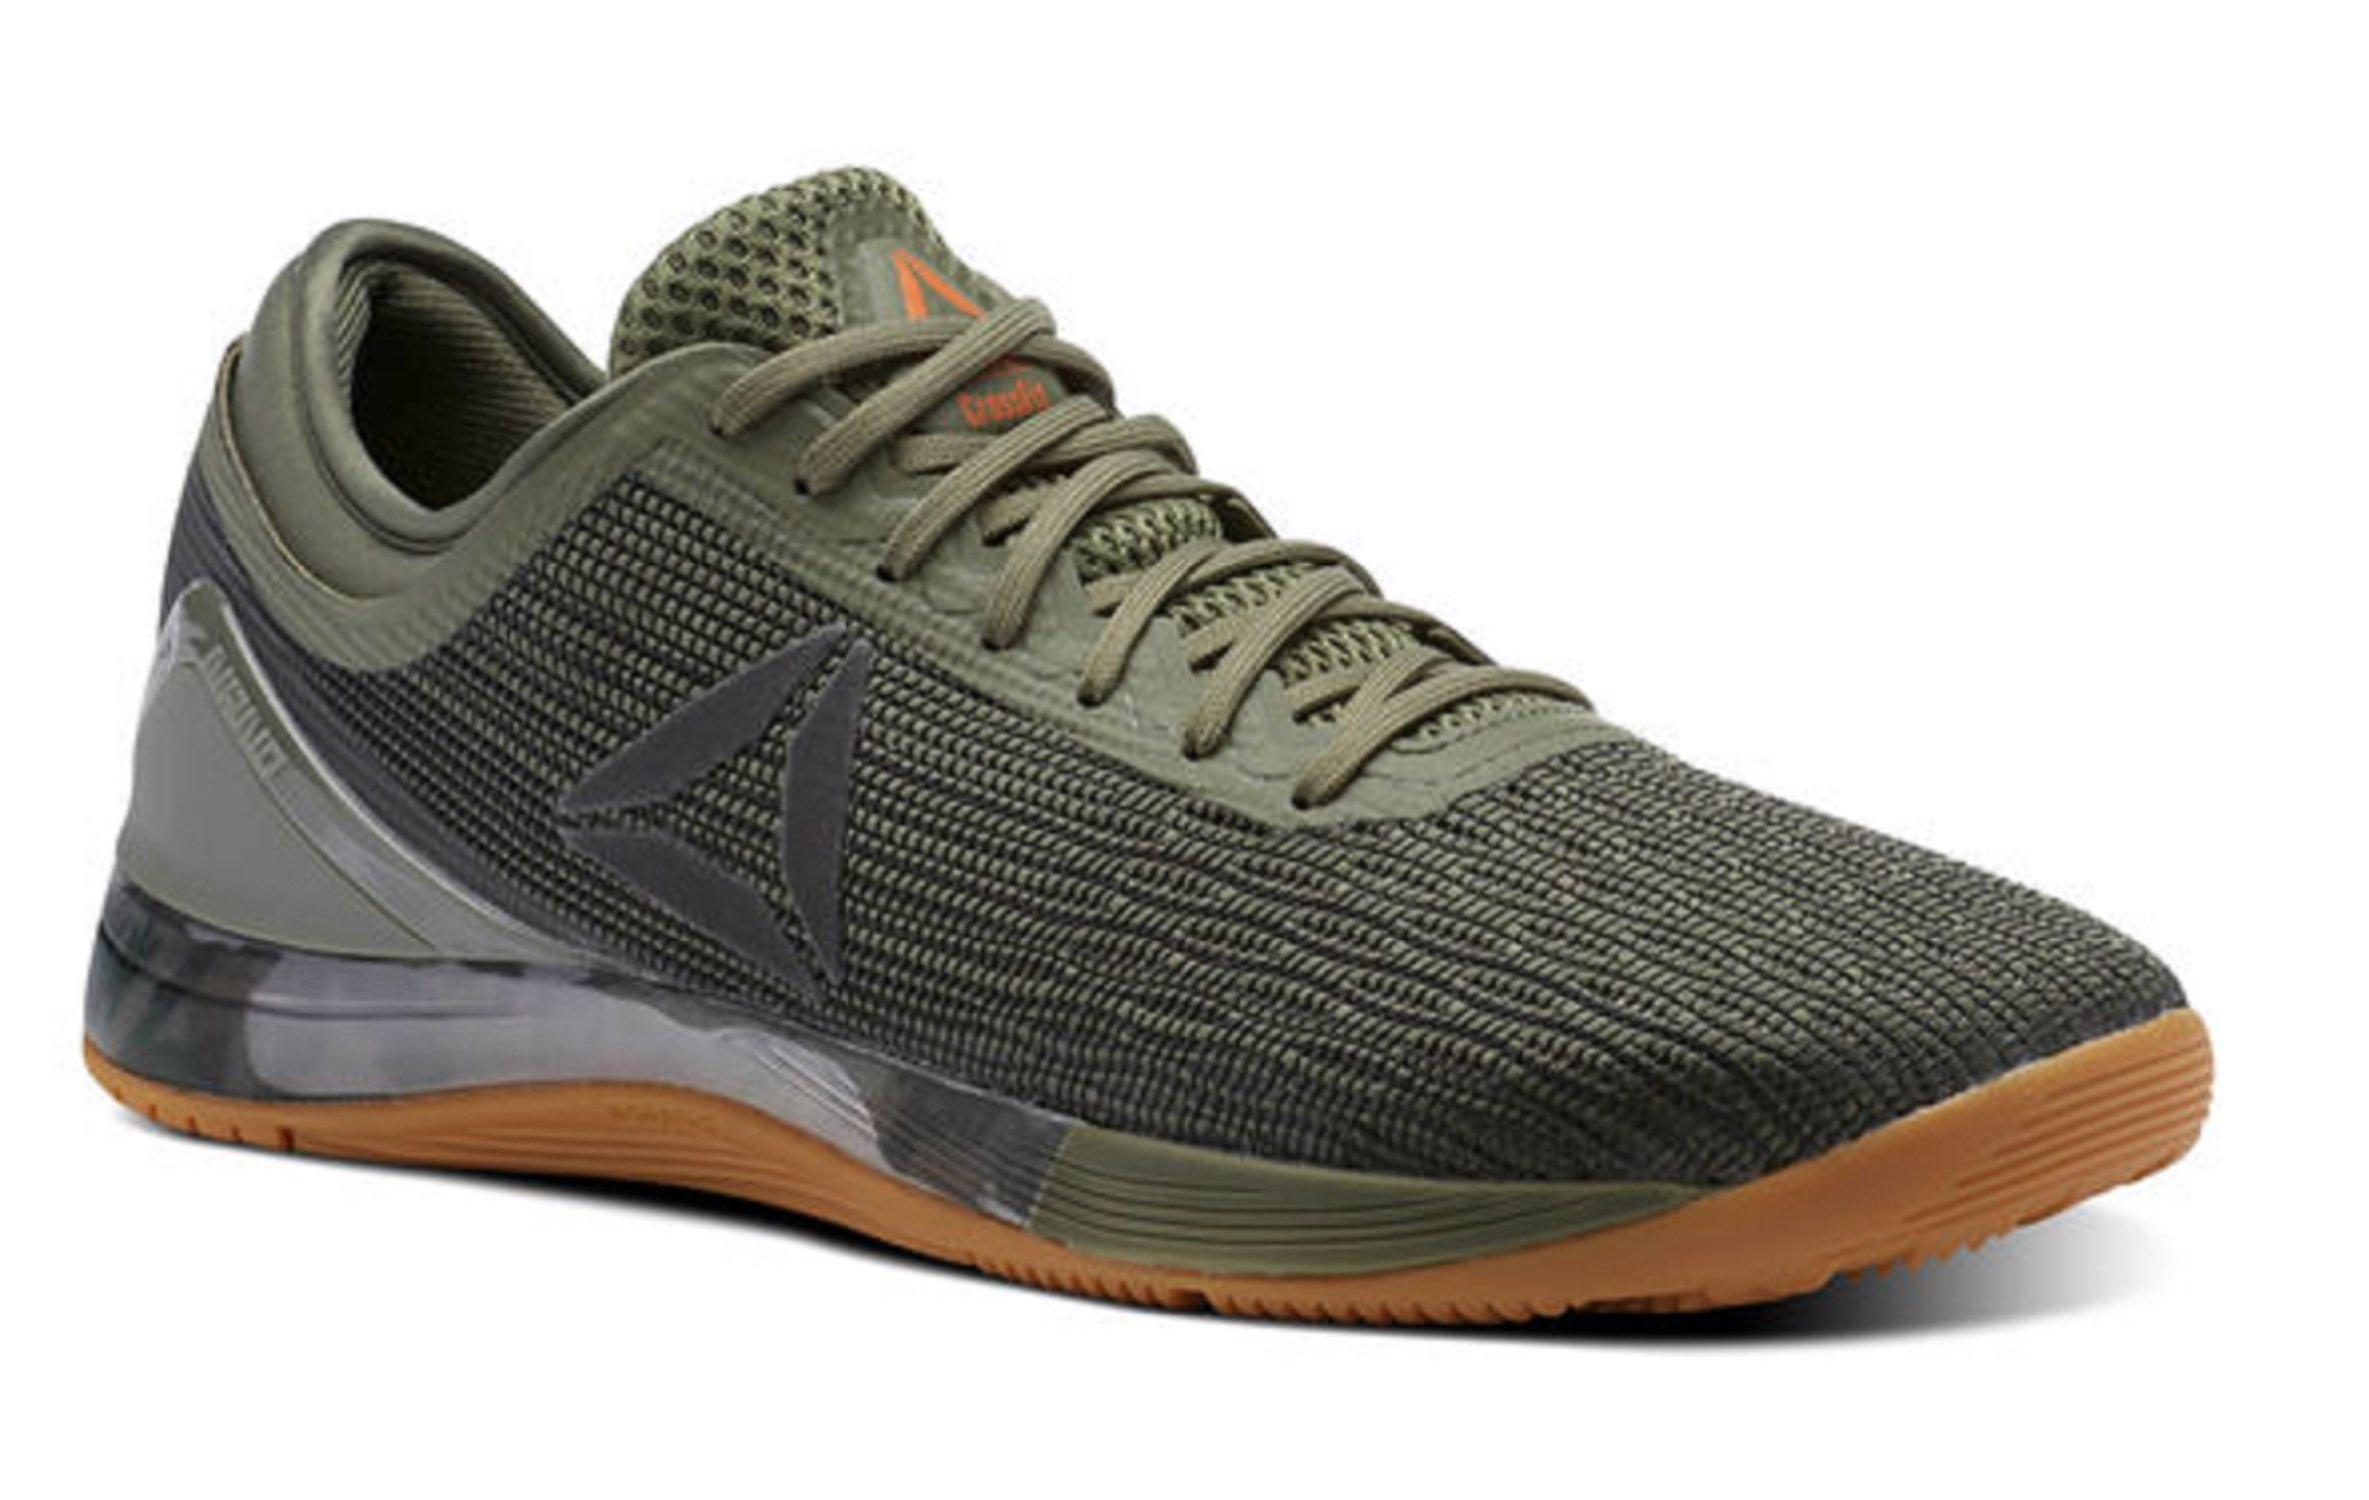 Reebok Men's CROSSFIT Nano 8.0 Sneaker, Hunter Green/Coal/Khaki/b, 6.5 M US by Reebok (Image #1)